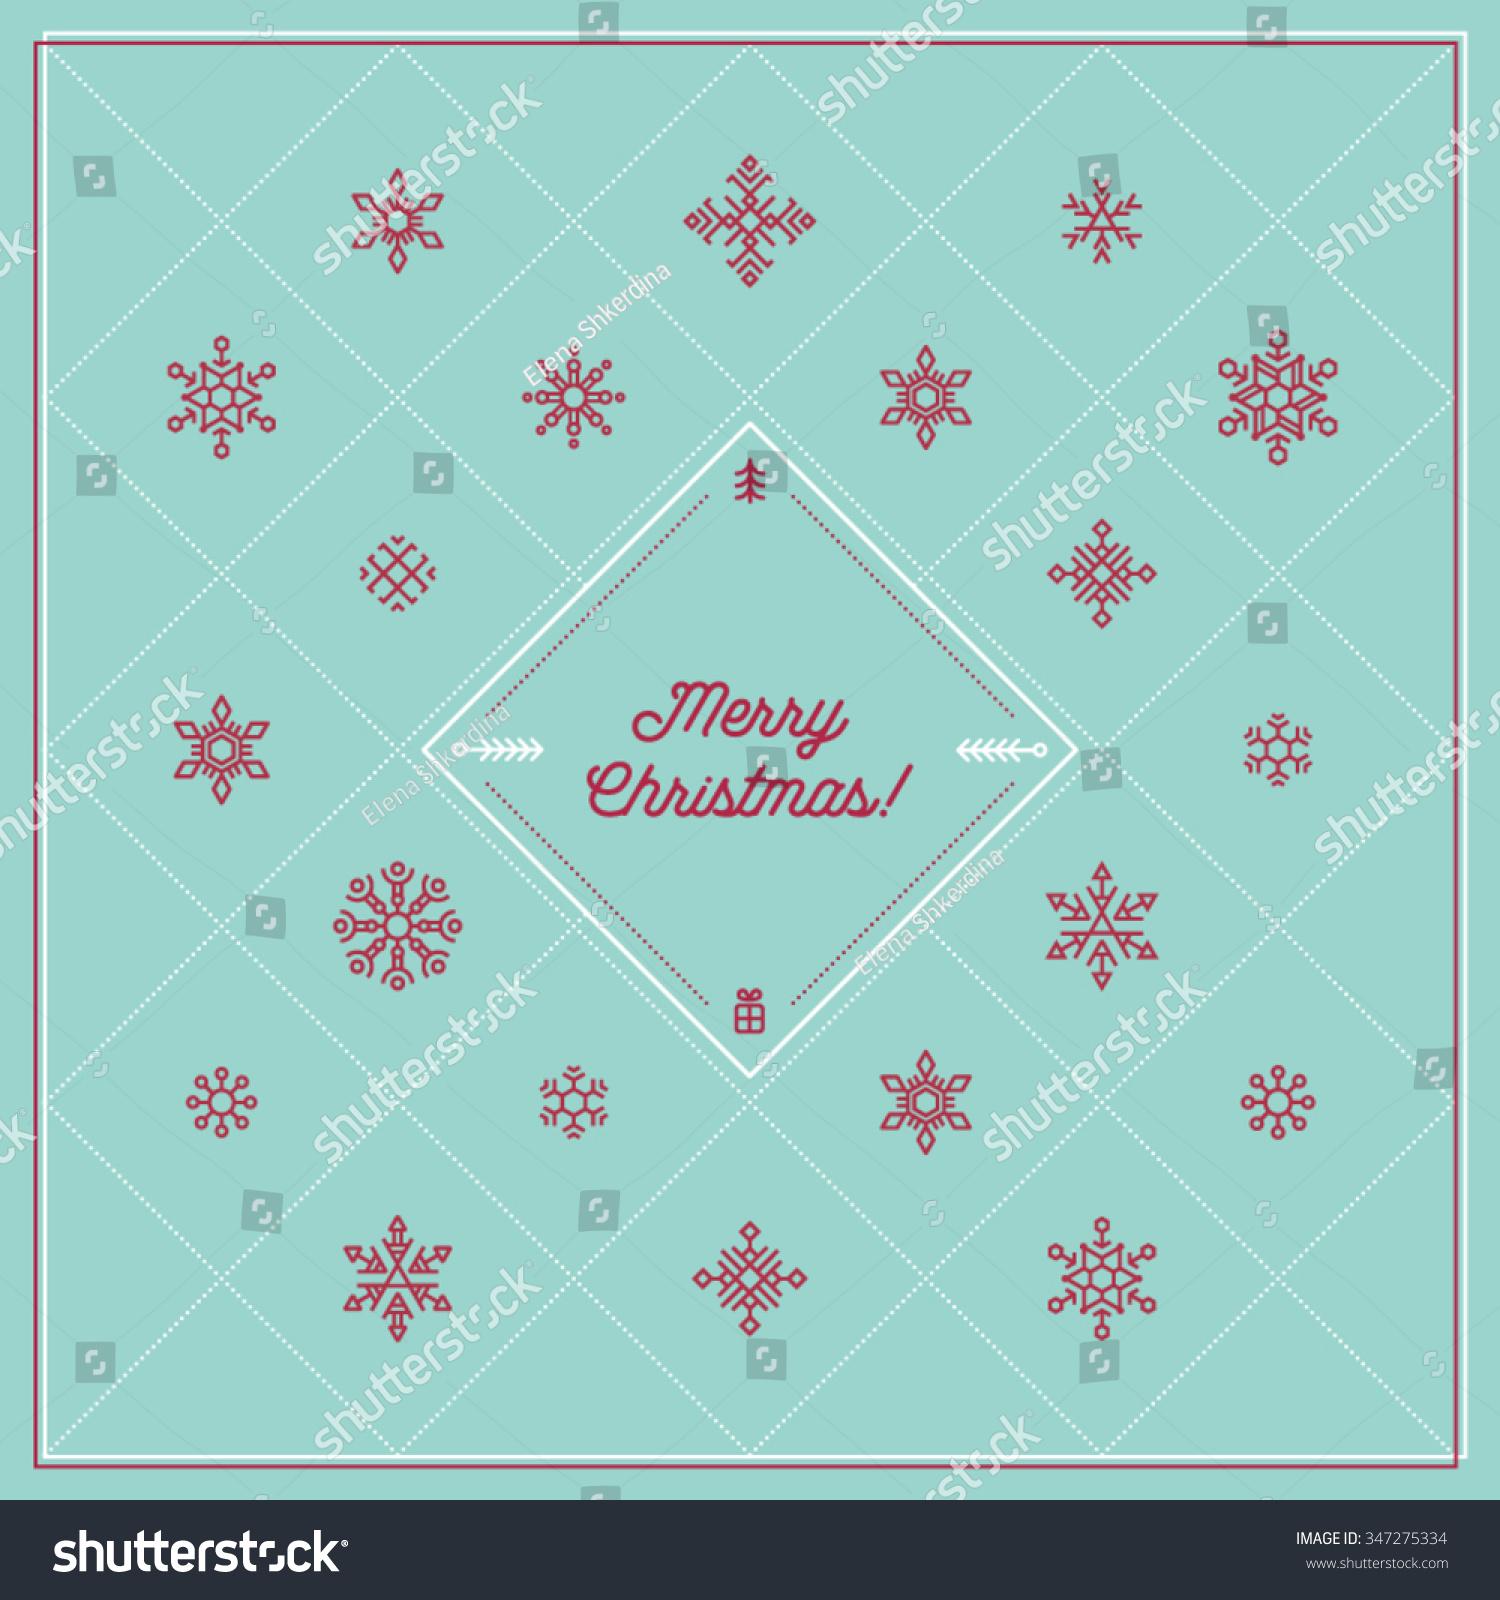 Neat Corporative Greeting Christmas Card Motivating Stock Vector